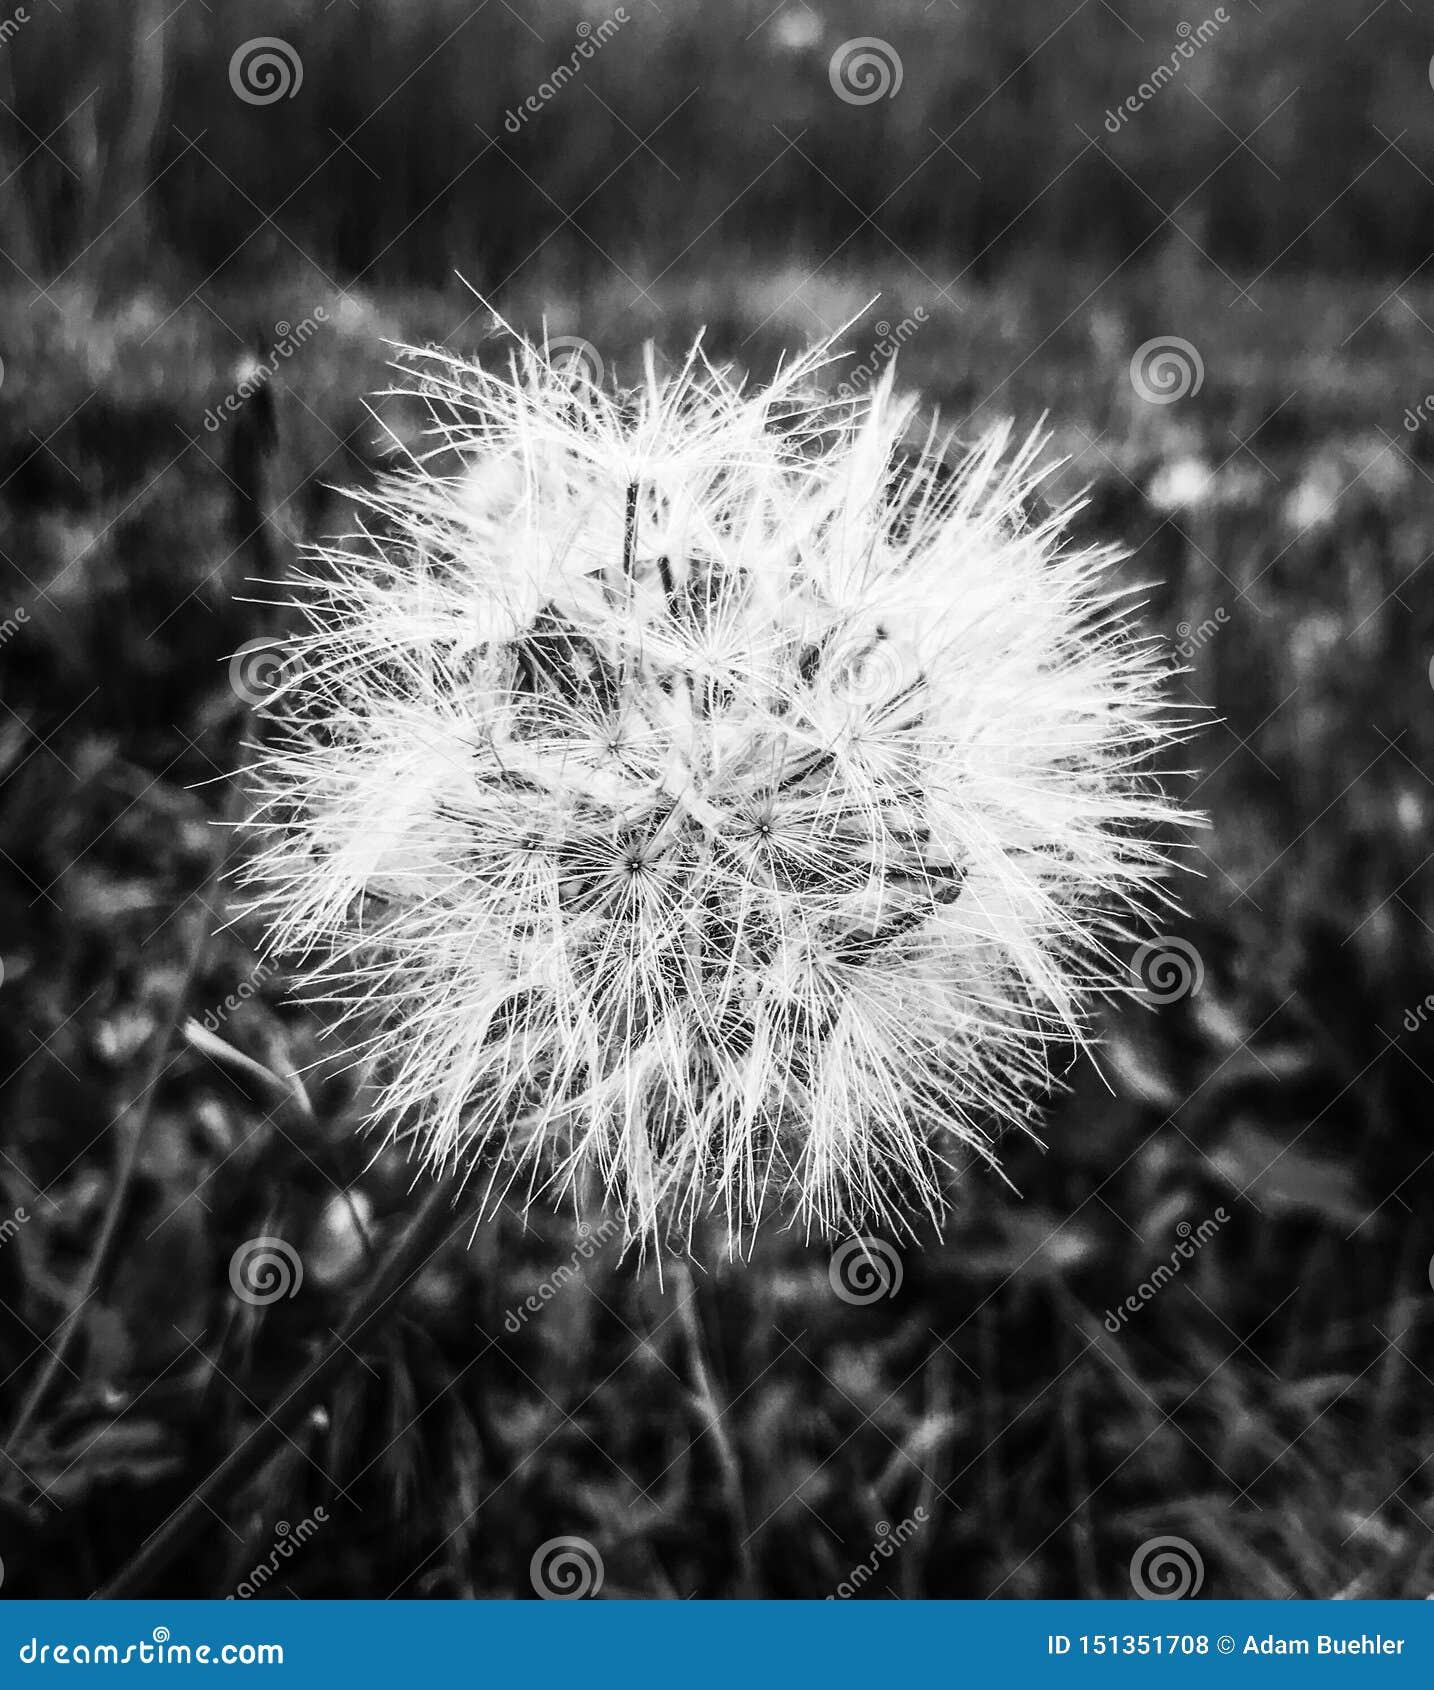 A closeup on a dandelion